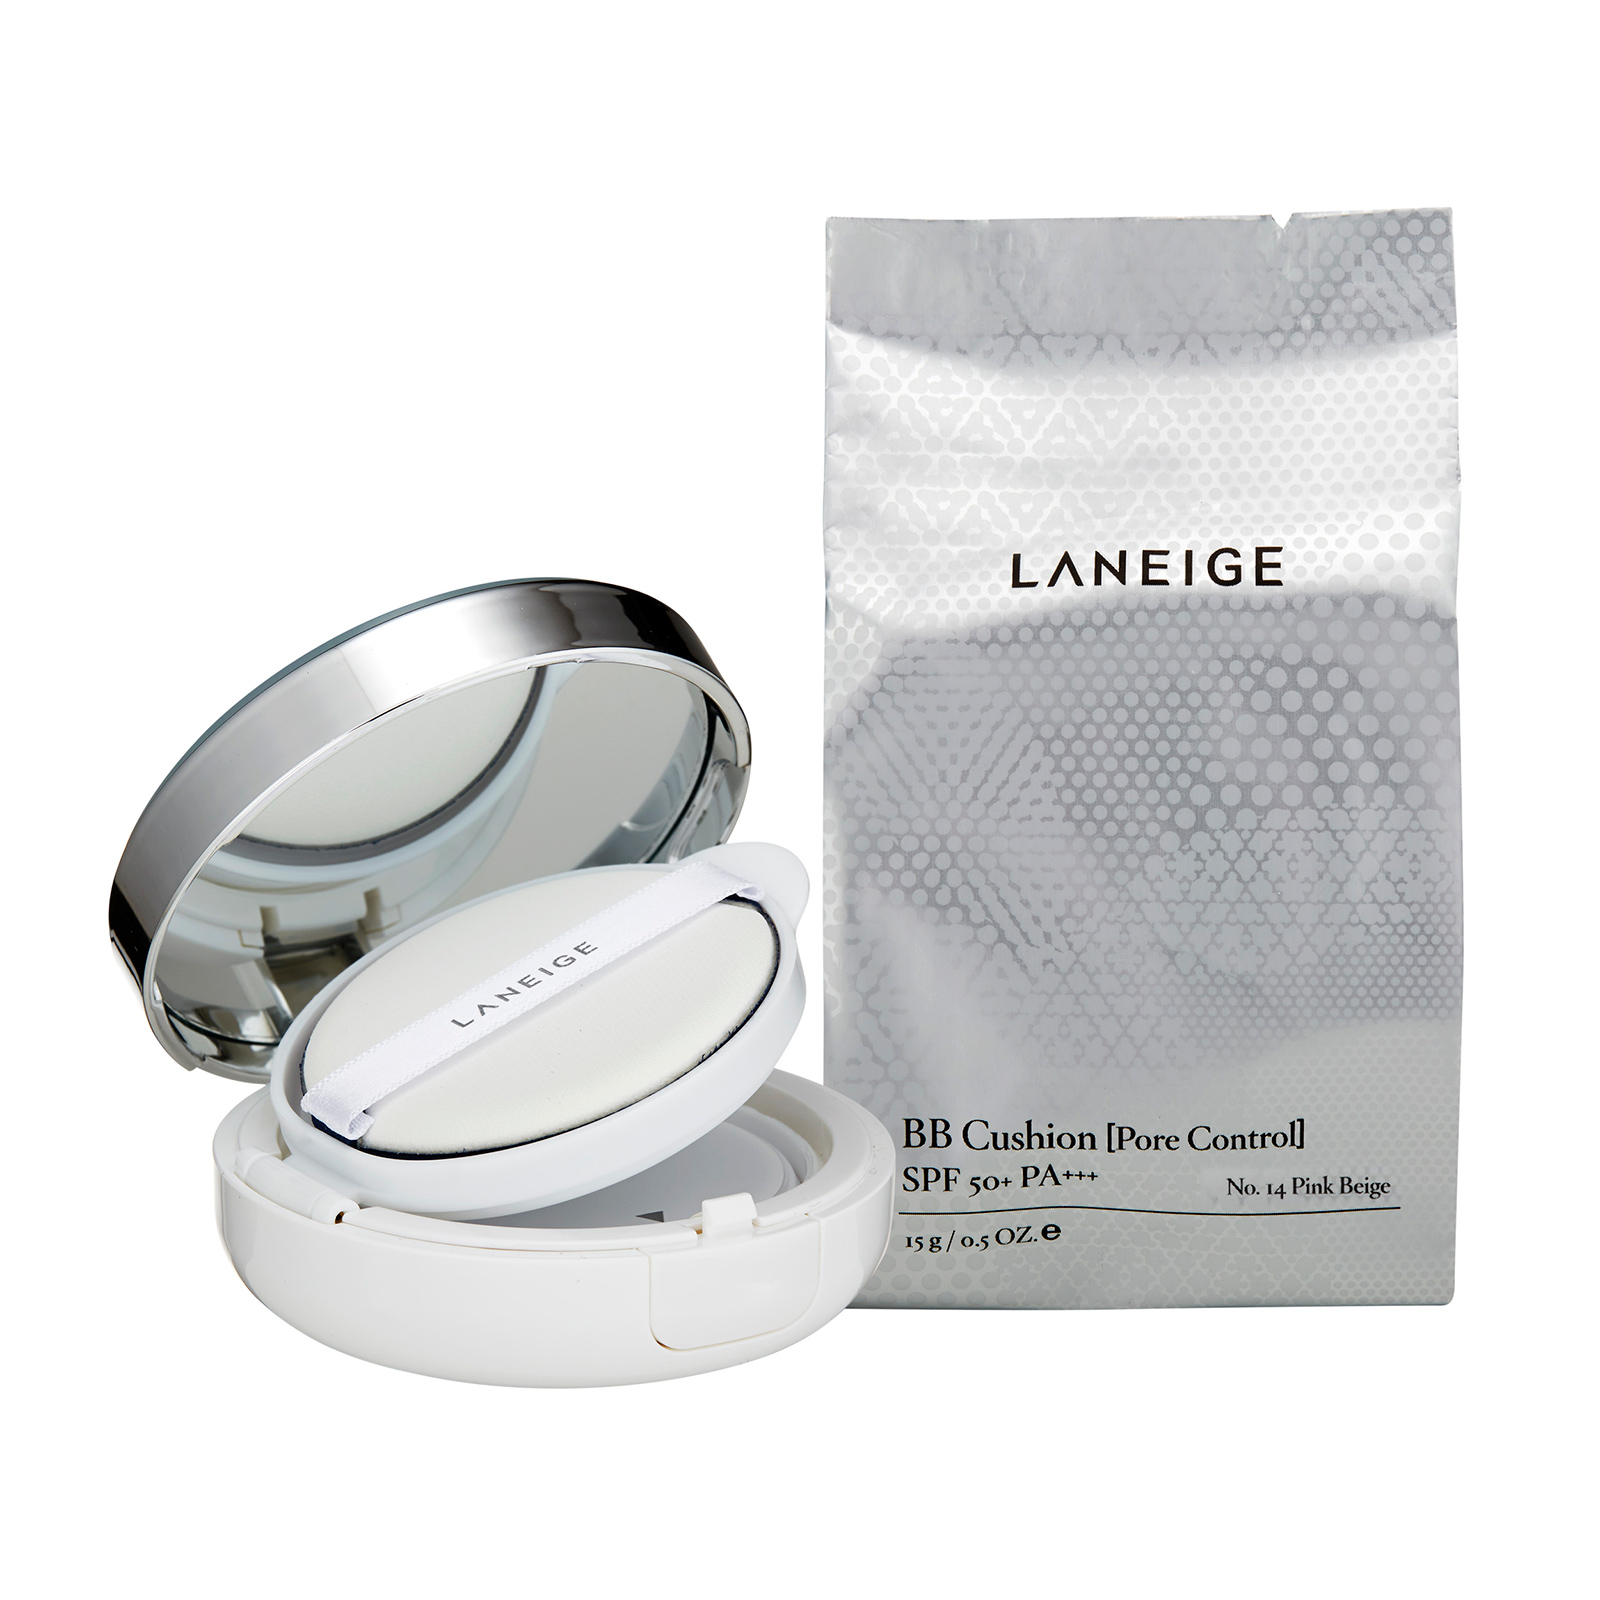 Laneige  BB Cushion [Pore Control] SPF50+ / PA+++ No.14 Pink Beige, 2 x 0.5oz, 2 x 15g